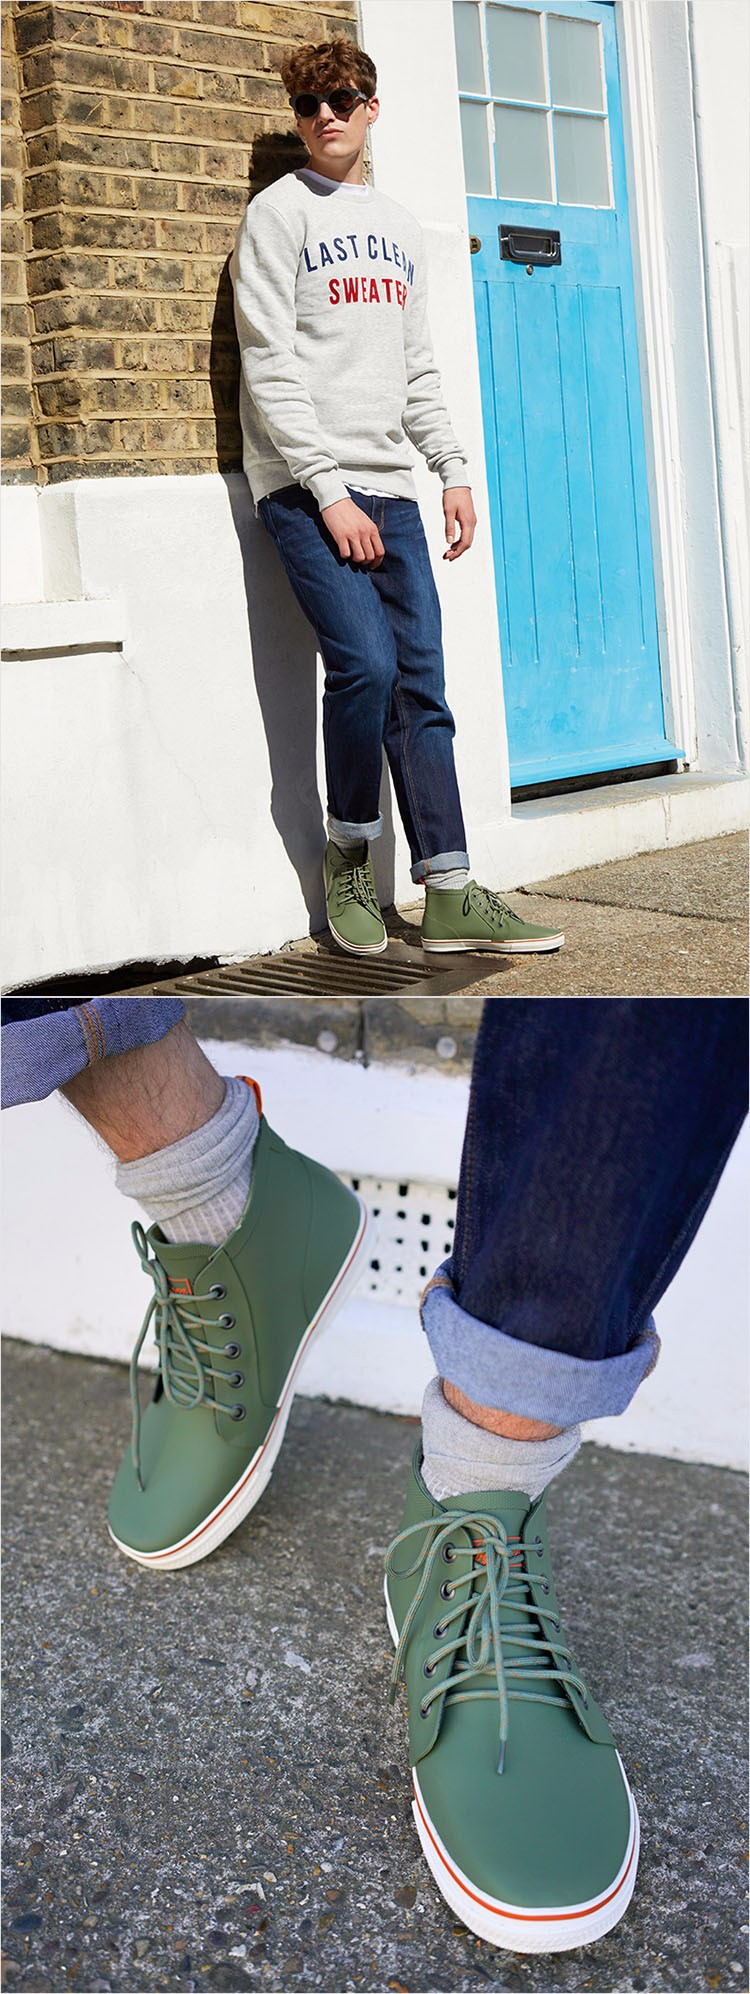 Hellozebra Men Rain Boots Autumn Fashion Lace Men 's Short Tube Water Boots Low Shoes Men Outdoor Waterproof Fishing 2017 New  (17)